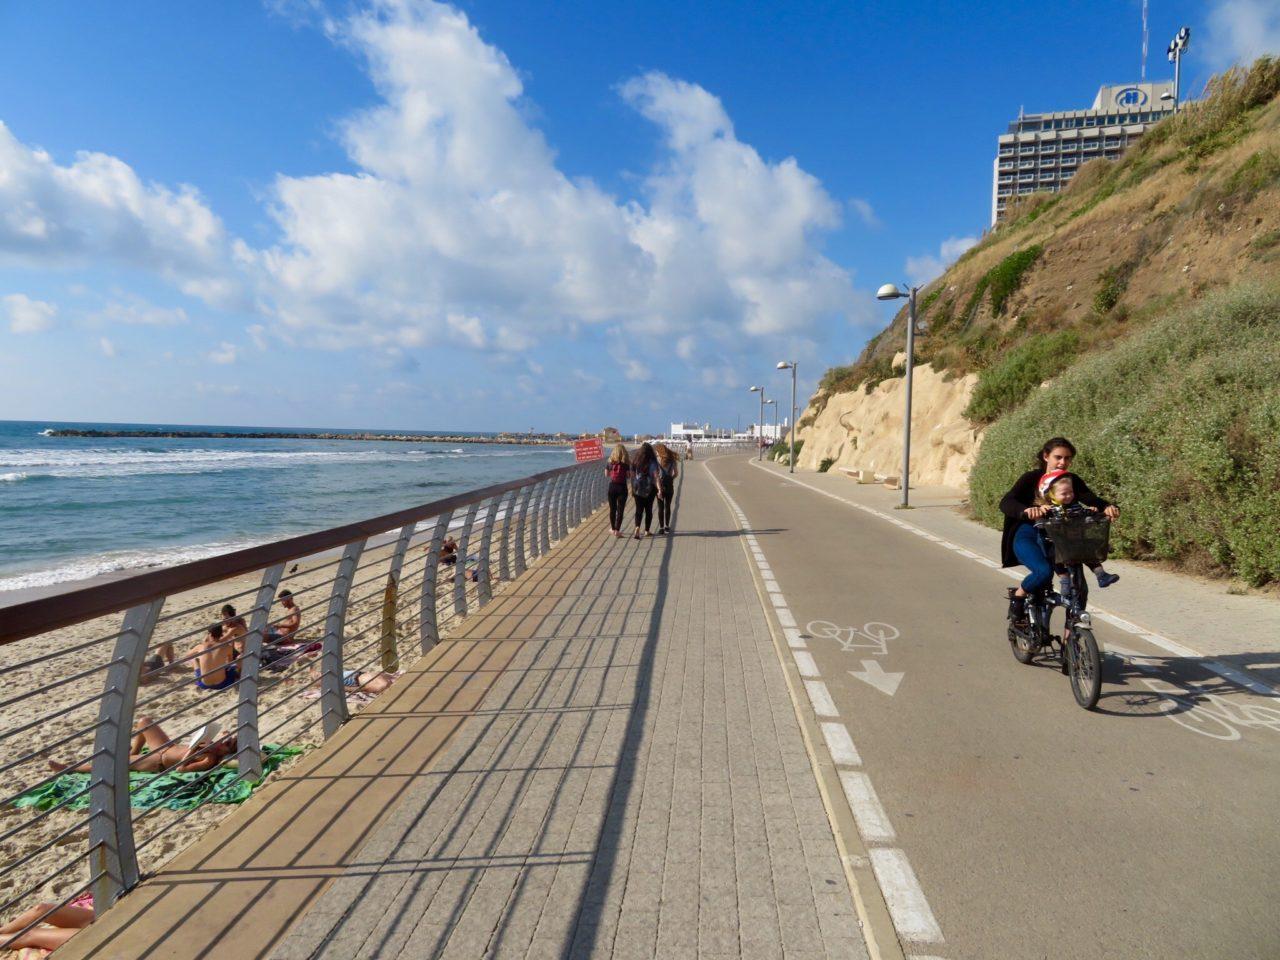 Tel Aviv Beach : The Promenade in front of Surfer's Beach